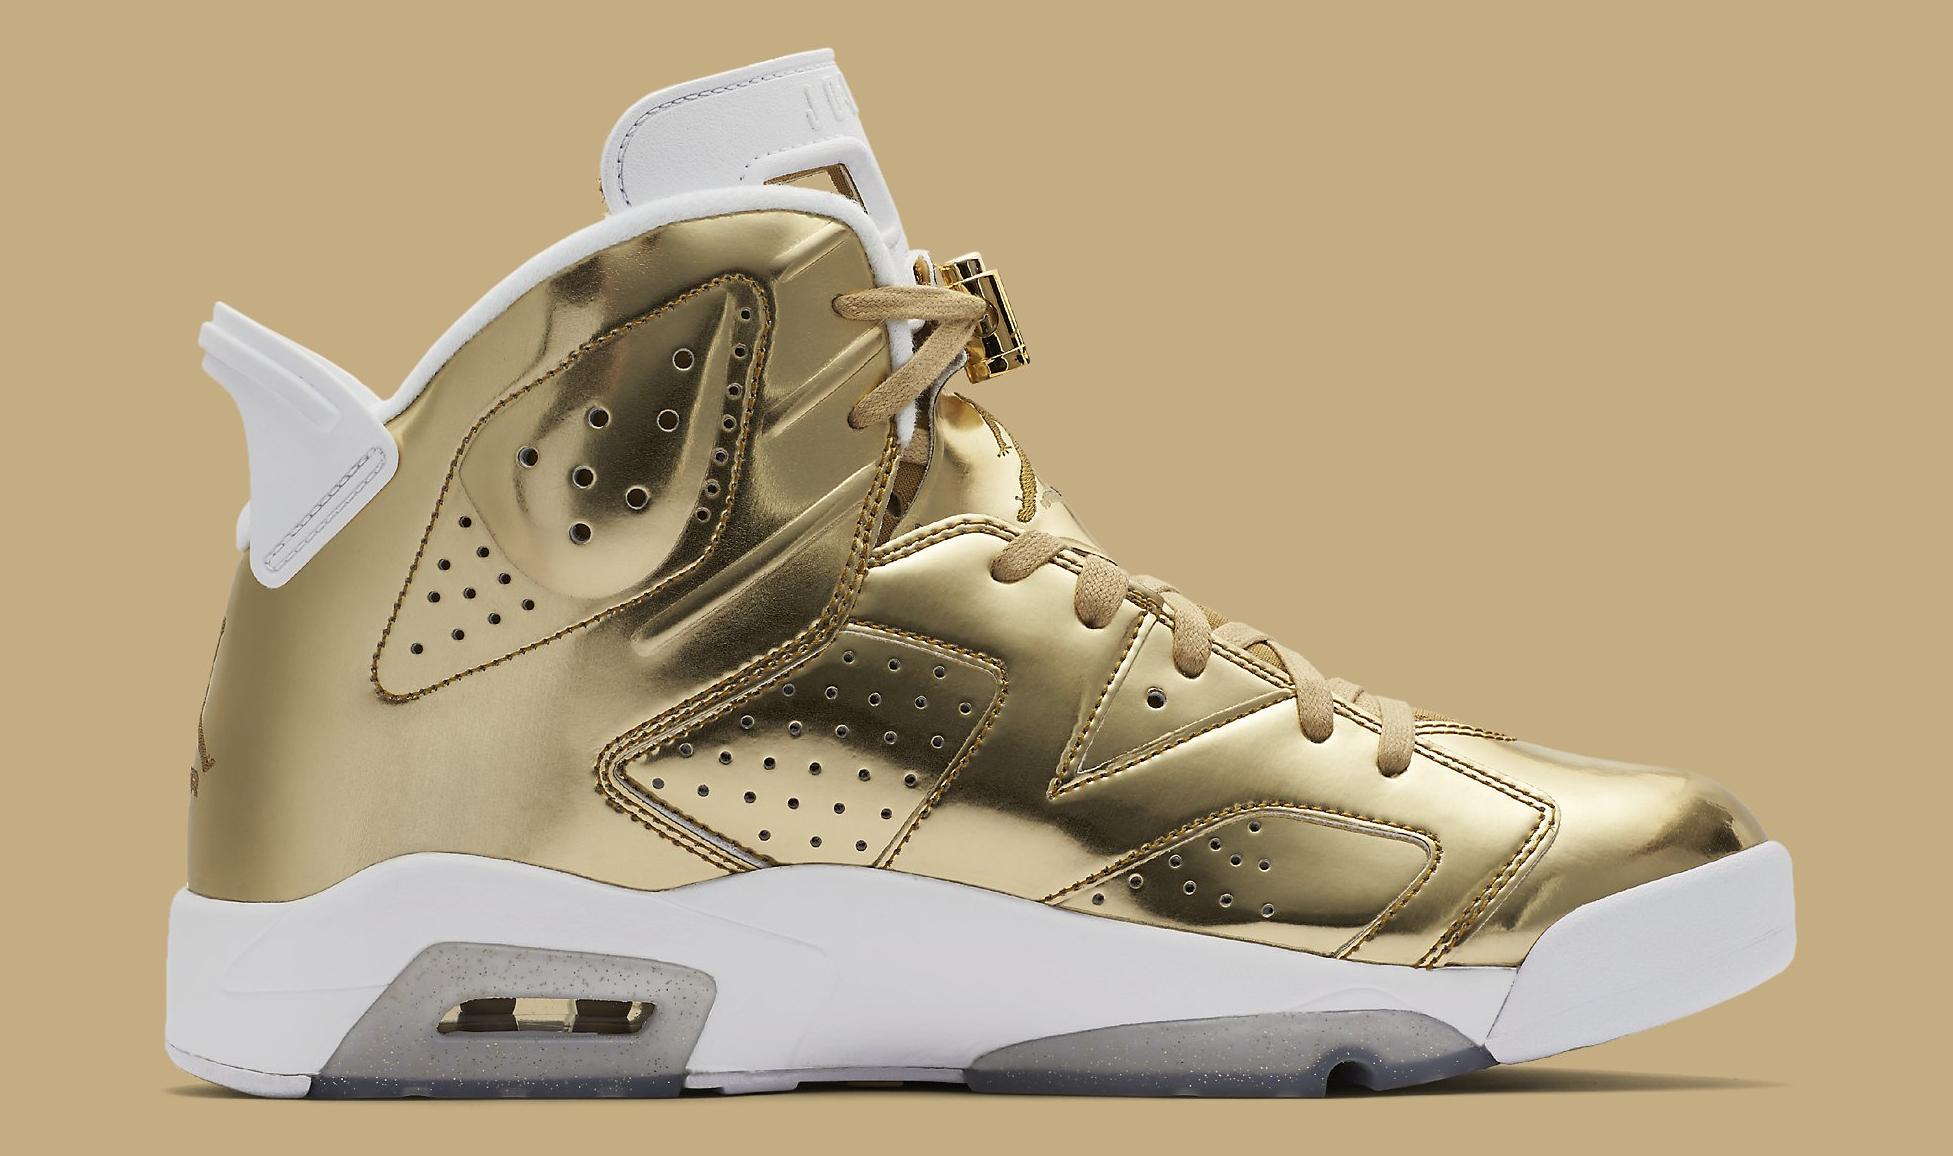 4fbb9fb372f4cb Image via Nike Gold Pinnacle Air Jordan 6 854271-730 Medial